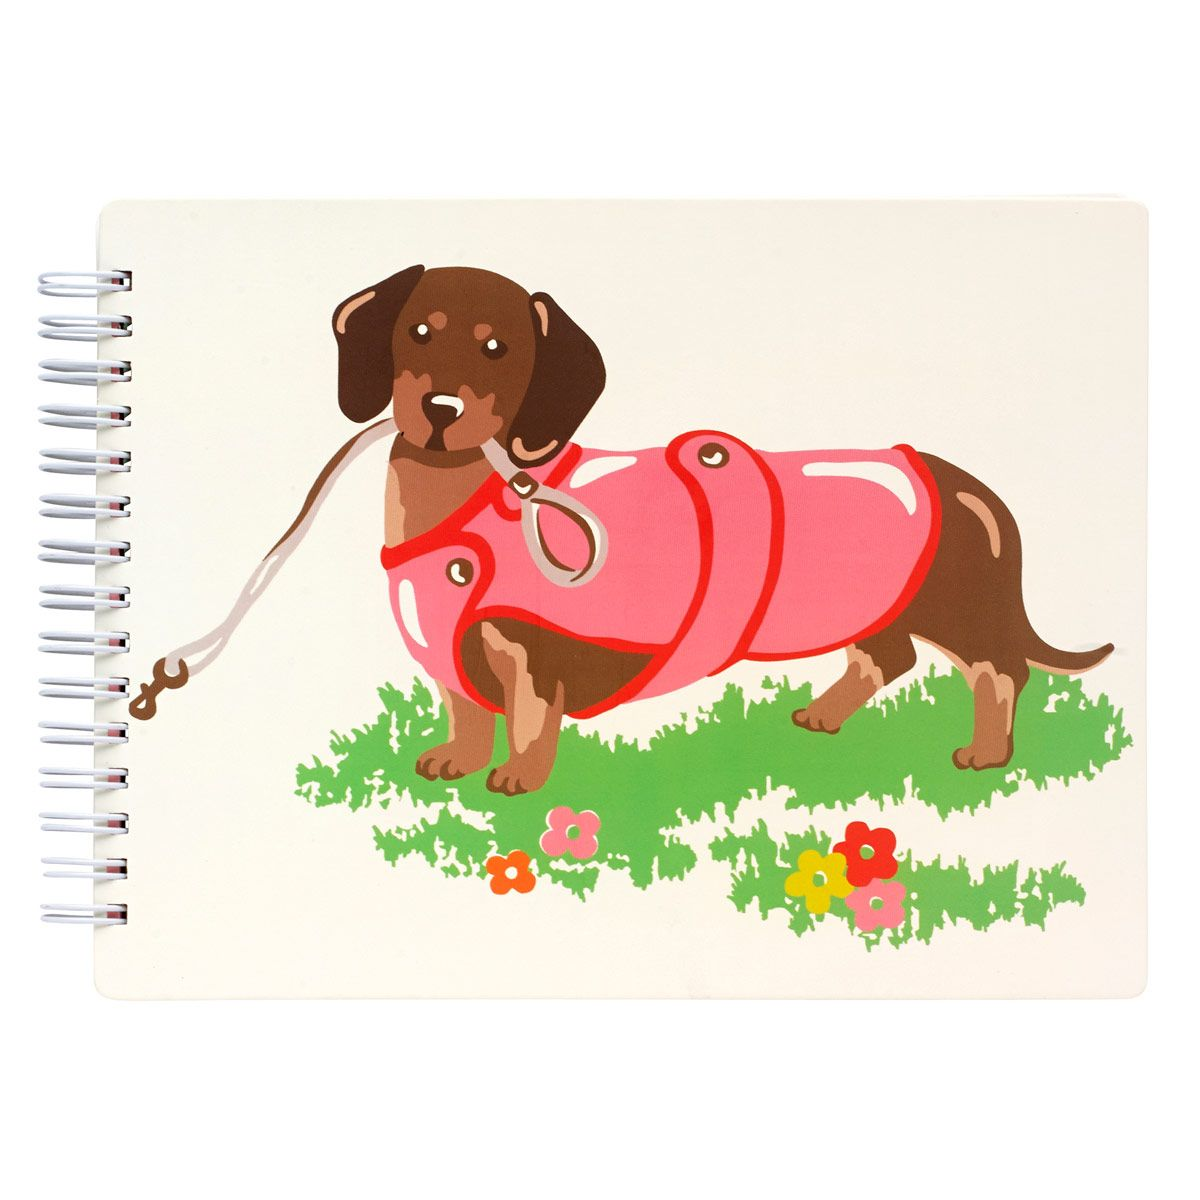 0c73248c1a0f Sausage Dogs Notepad   CathKidston   Ilustrar